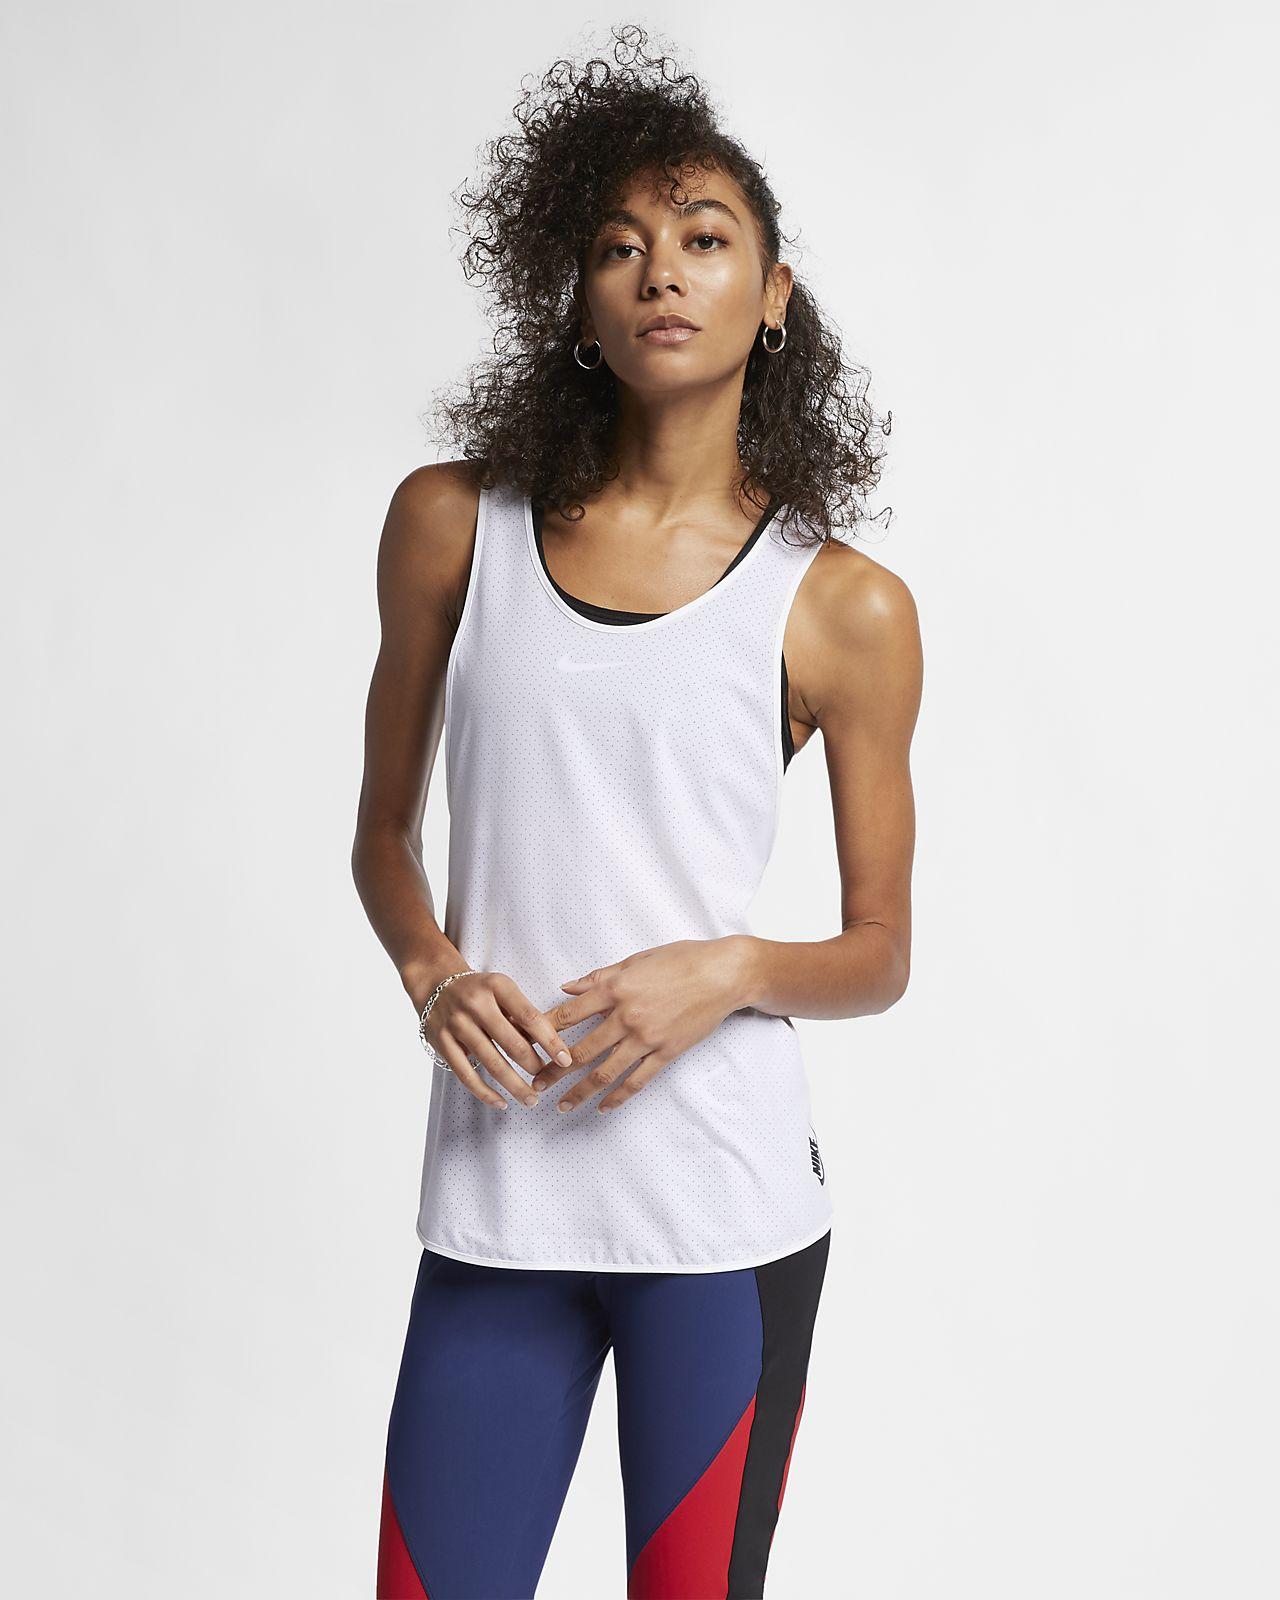 Nike City Ready Women's Tank